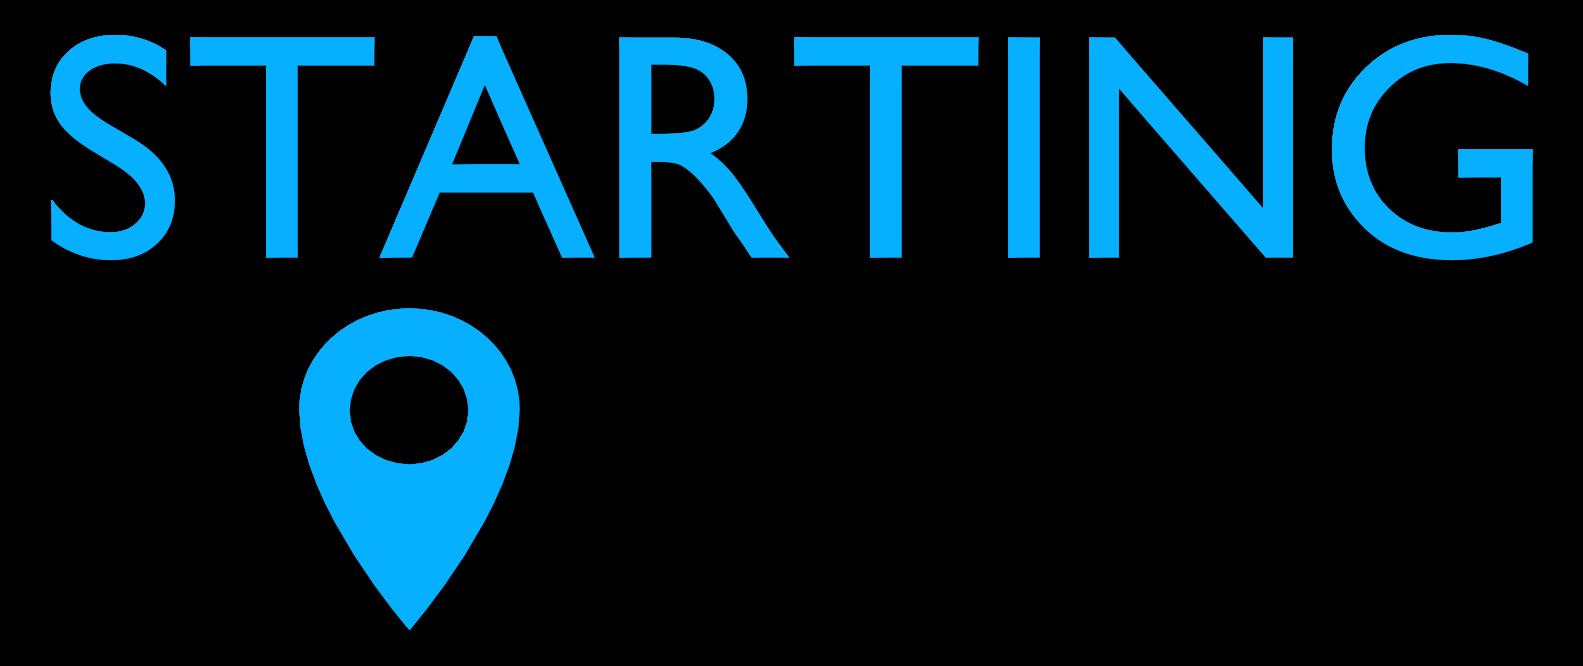 Starting pointe logo